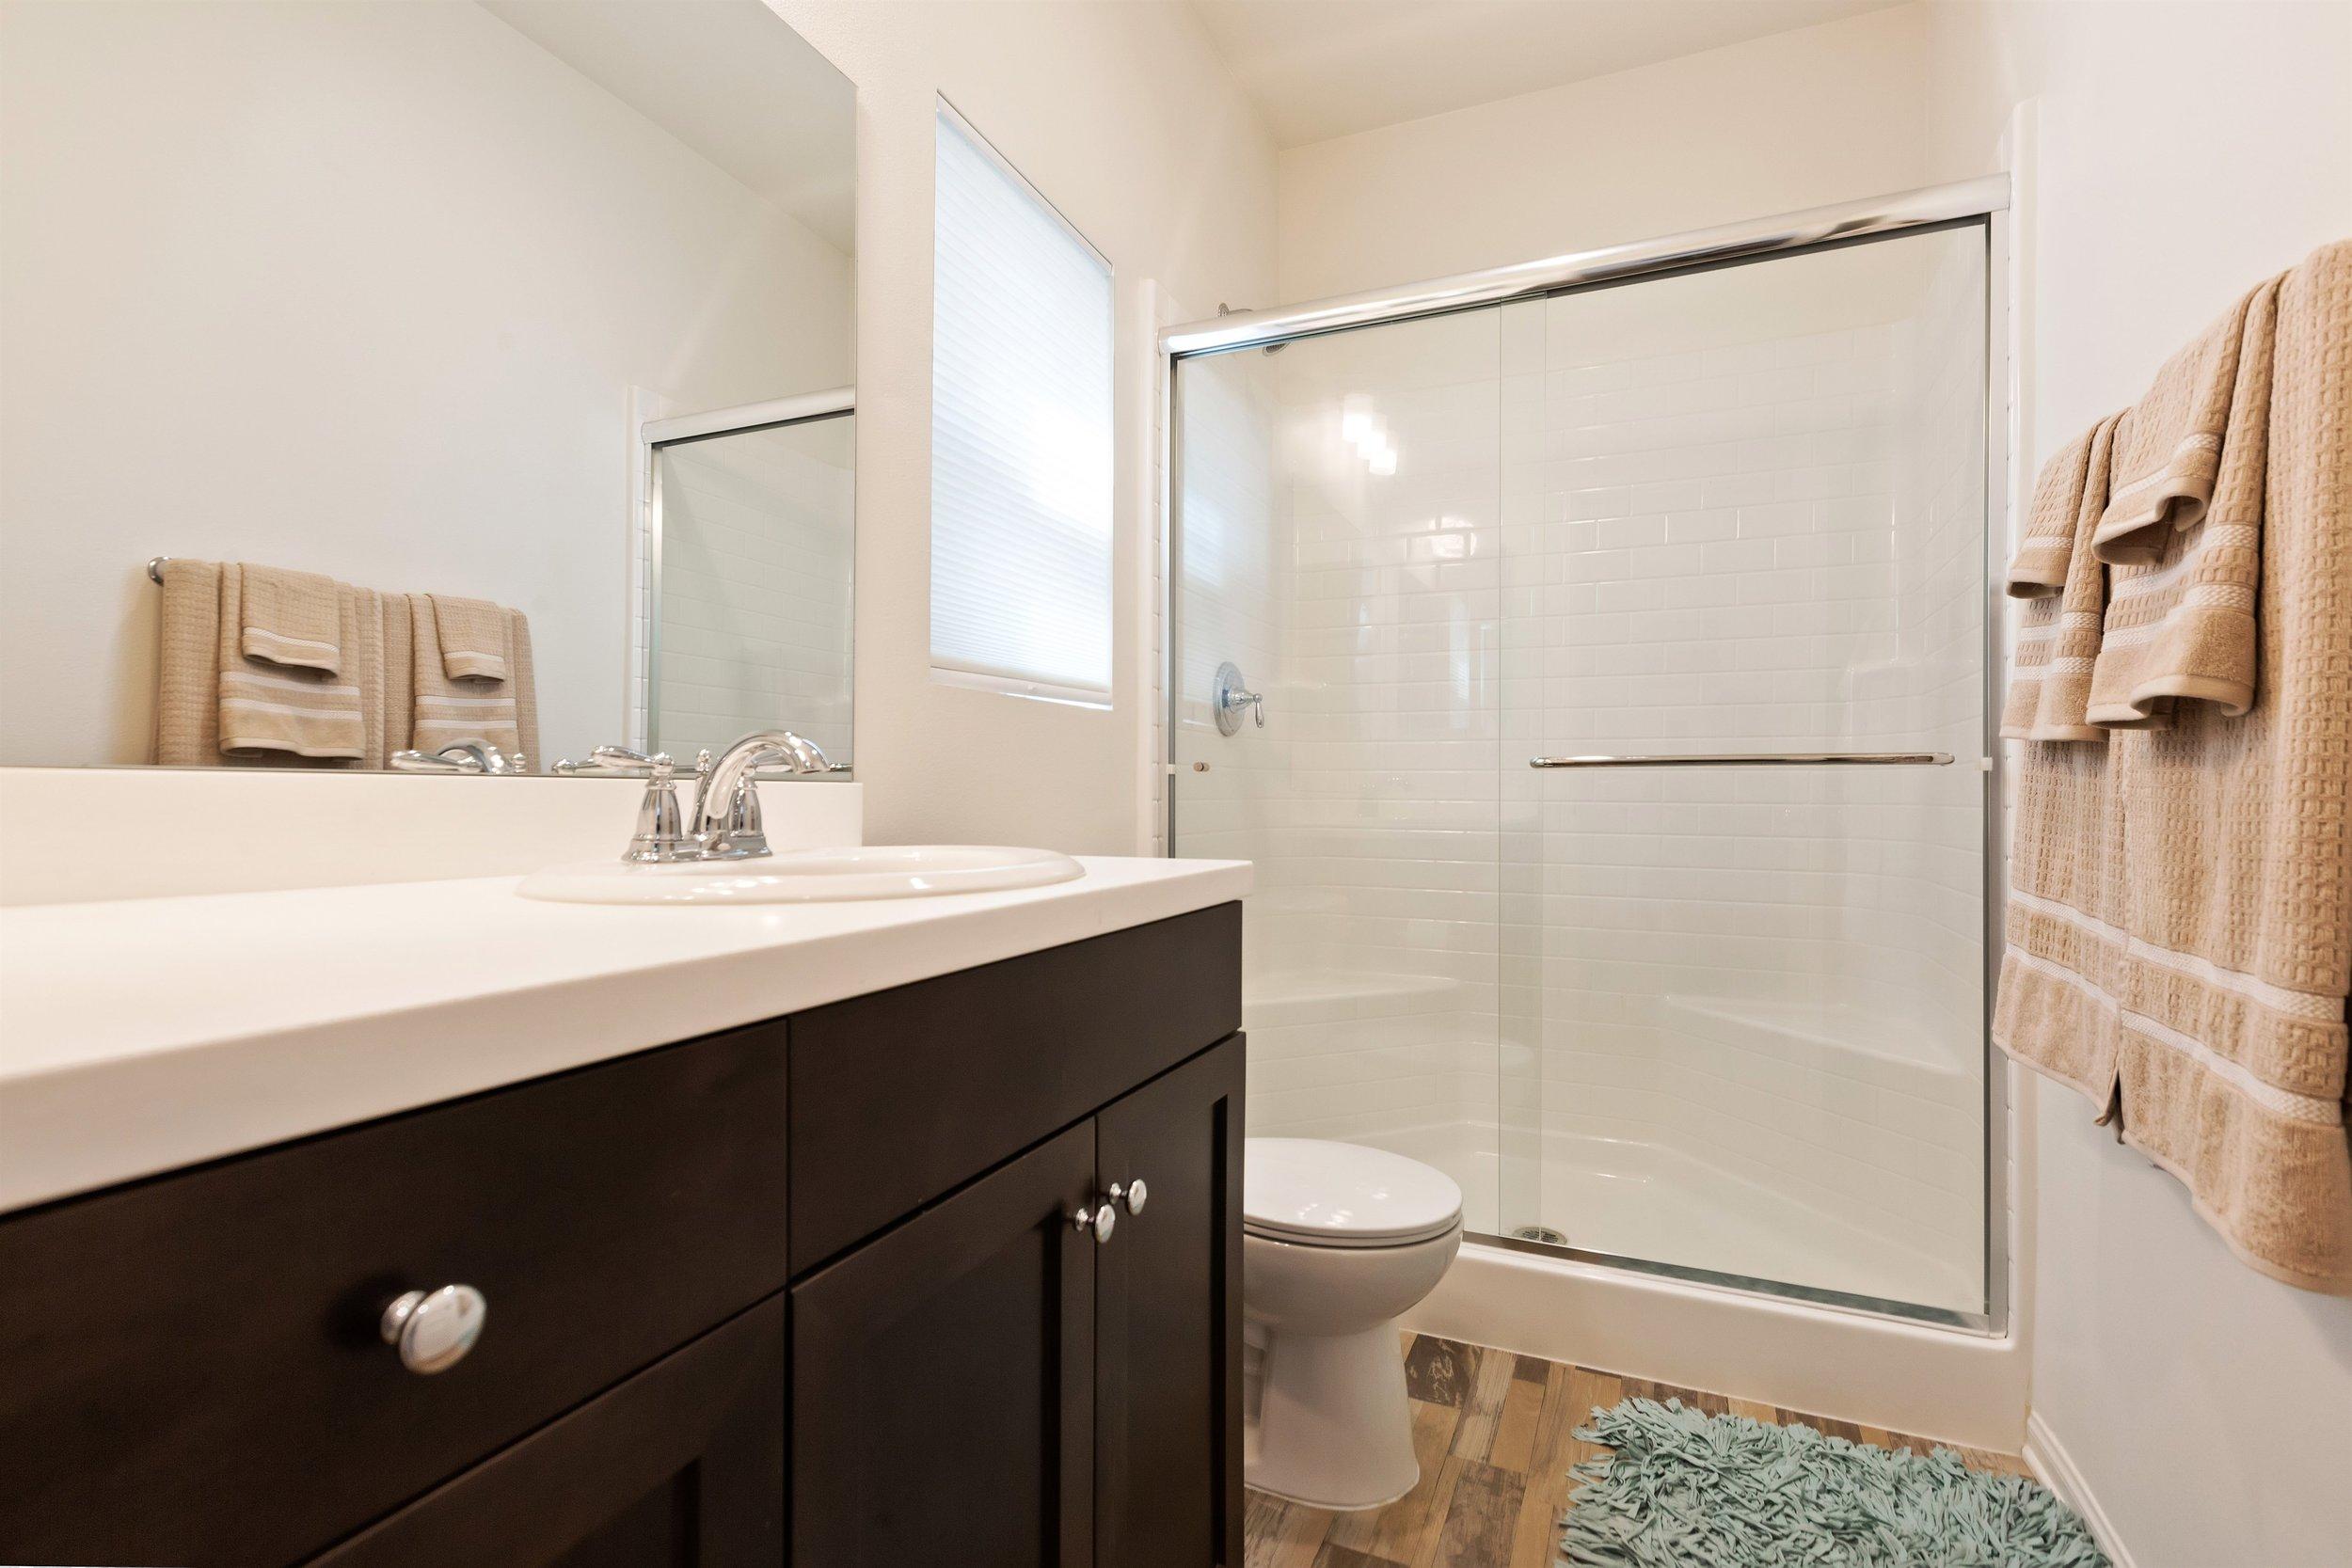 008_Bathroom.jpg